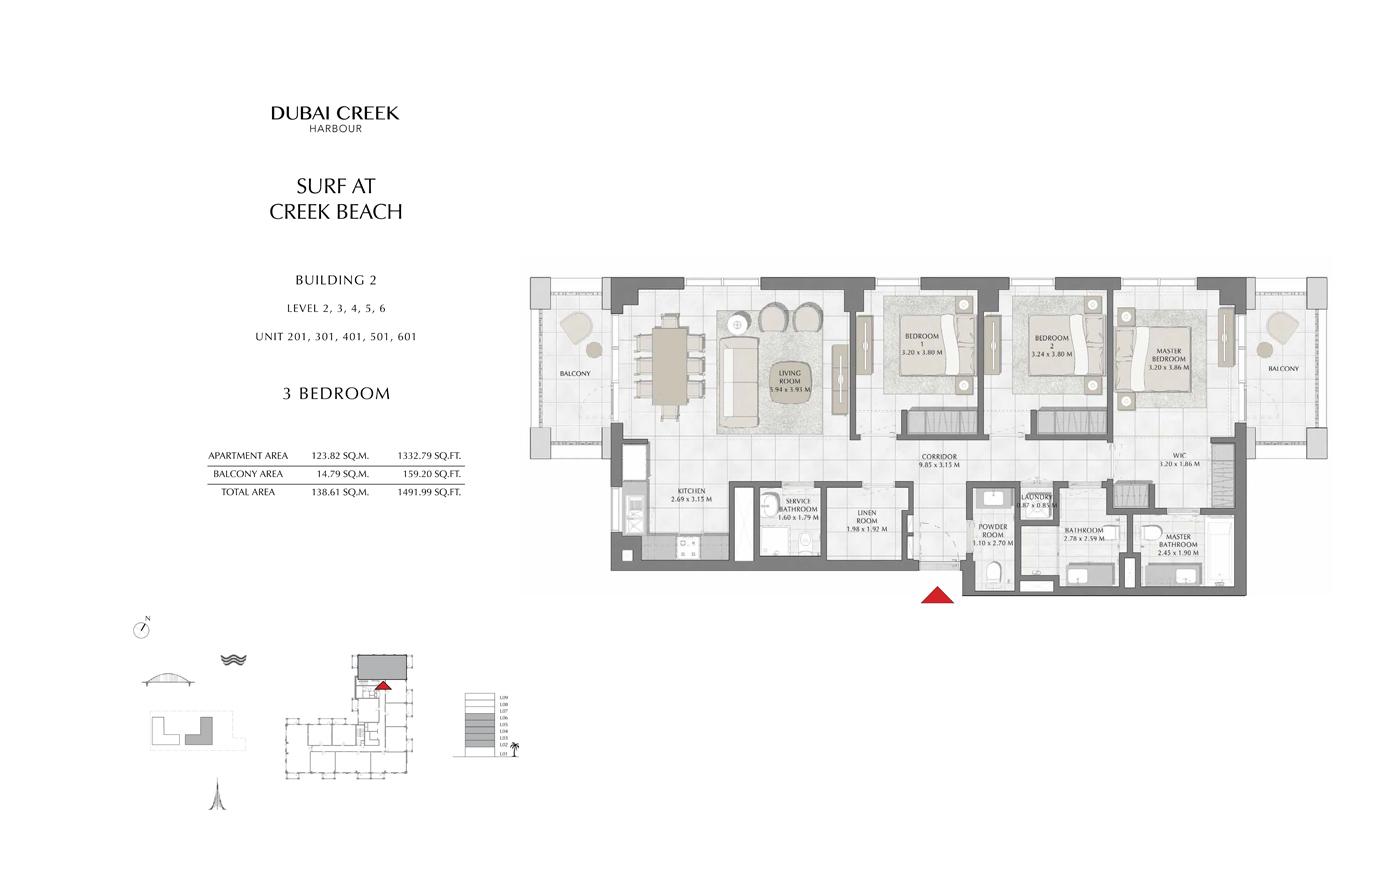 Building 2 , 3 Bedroom Level 2, 3, 4, 5, 6, Size 1491 Sq Ft